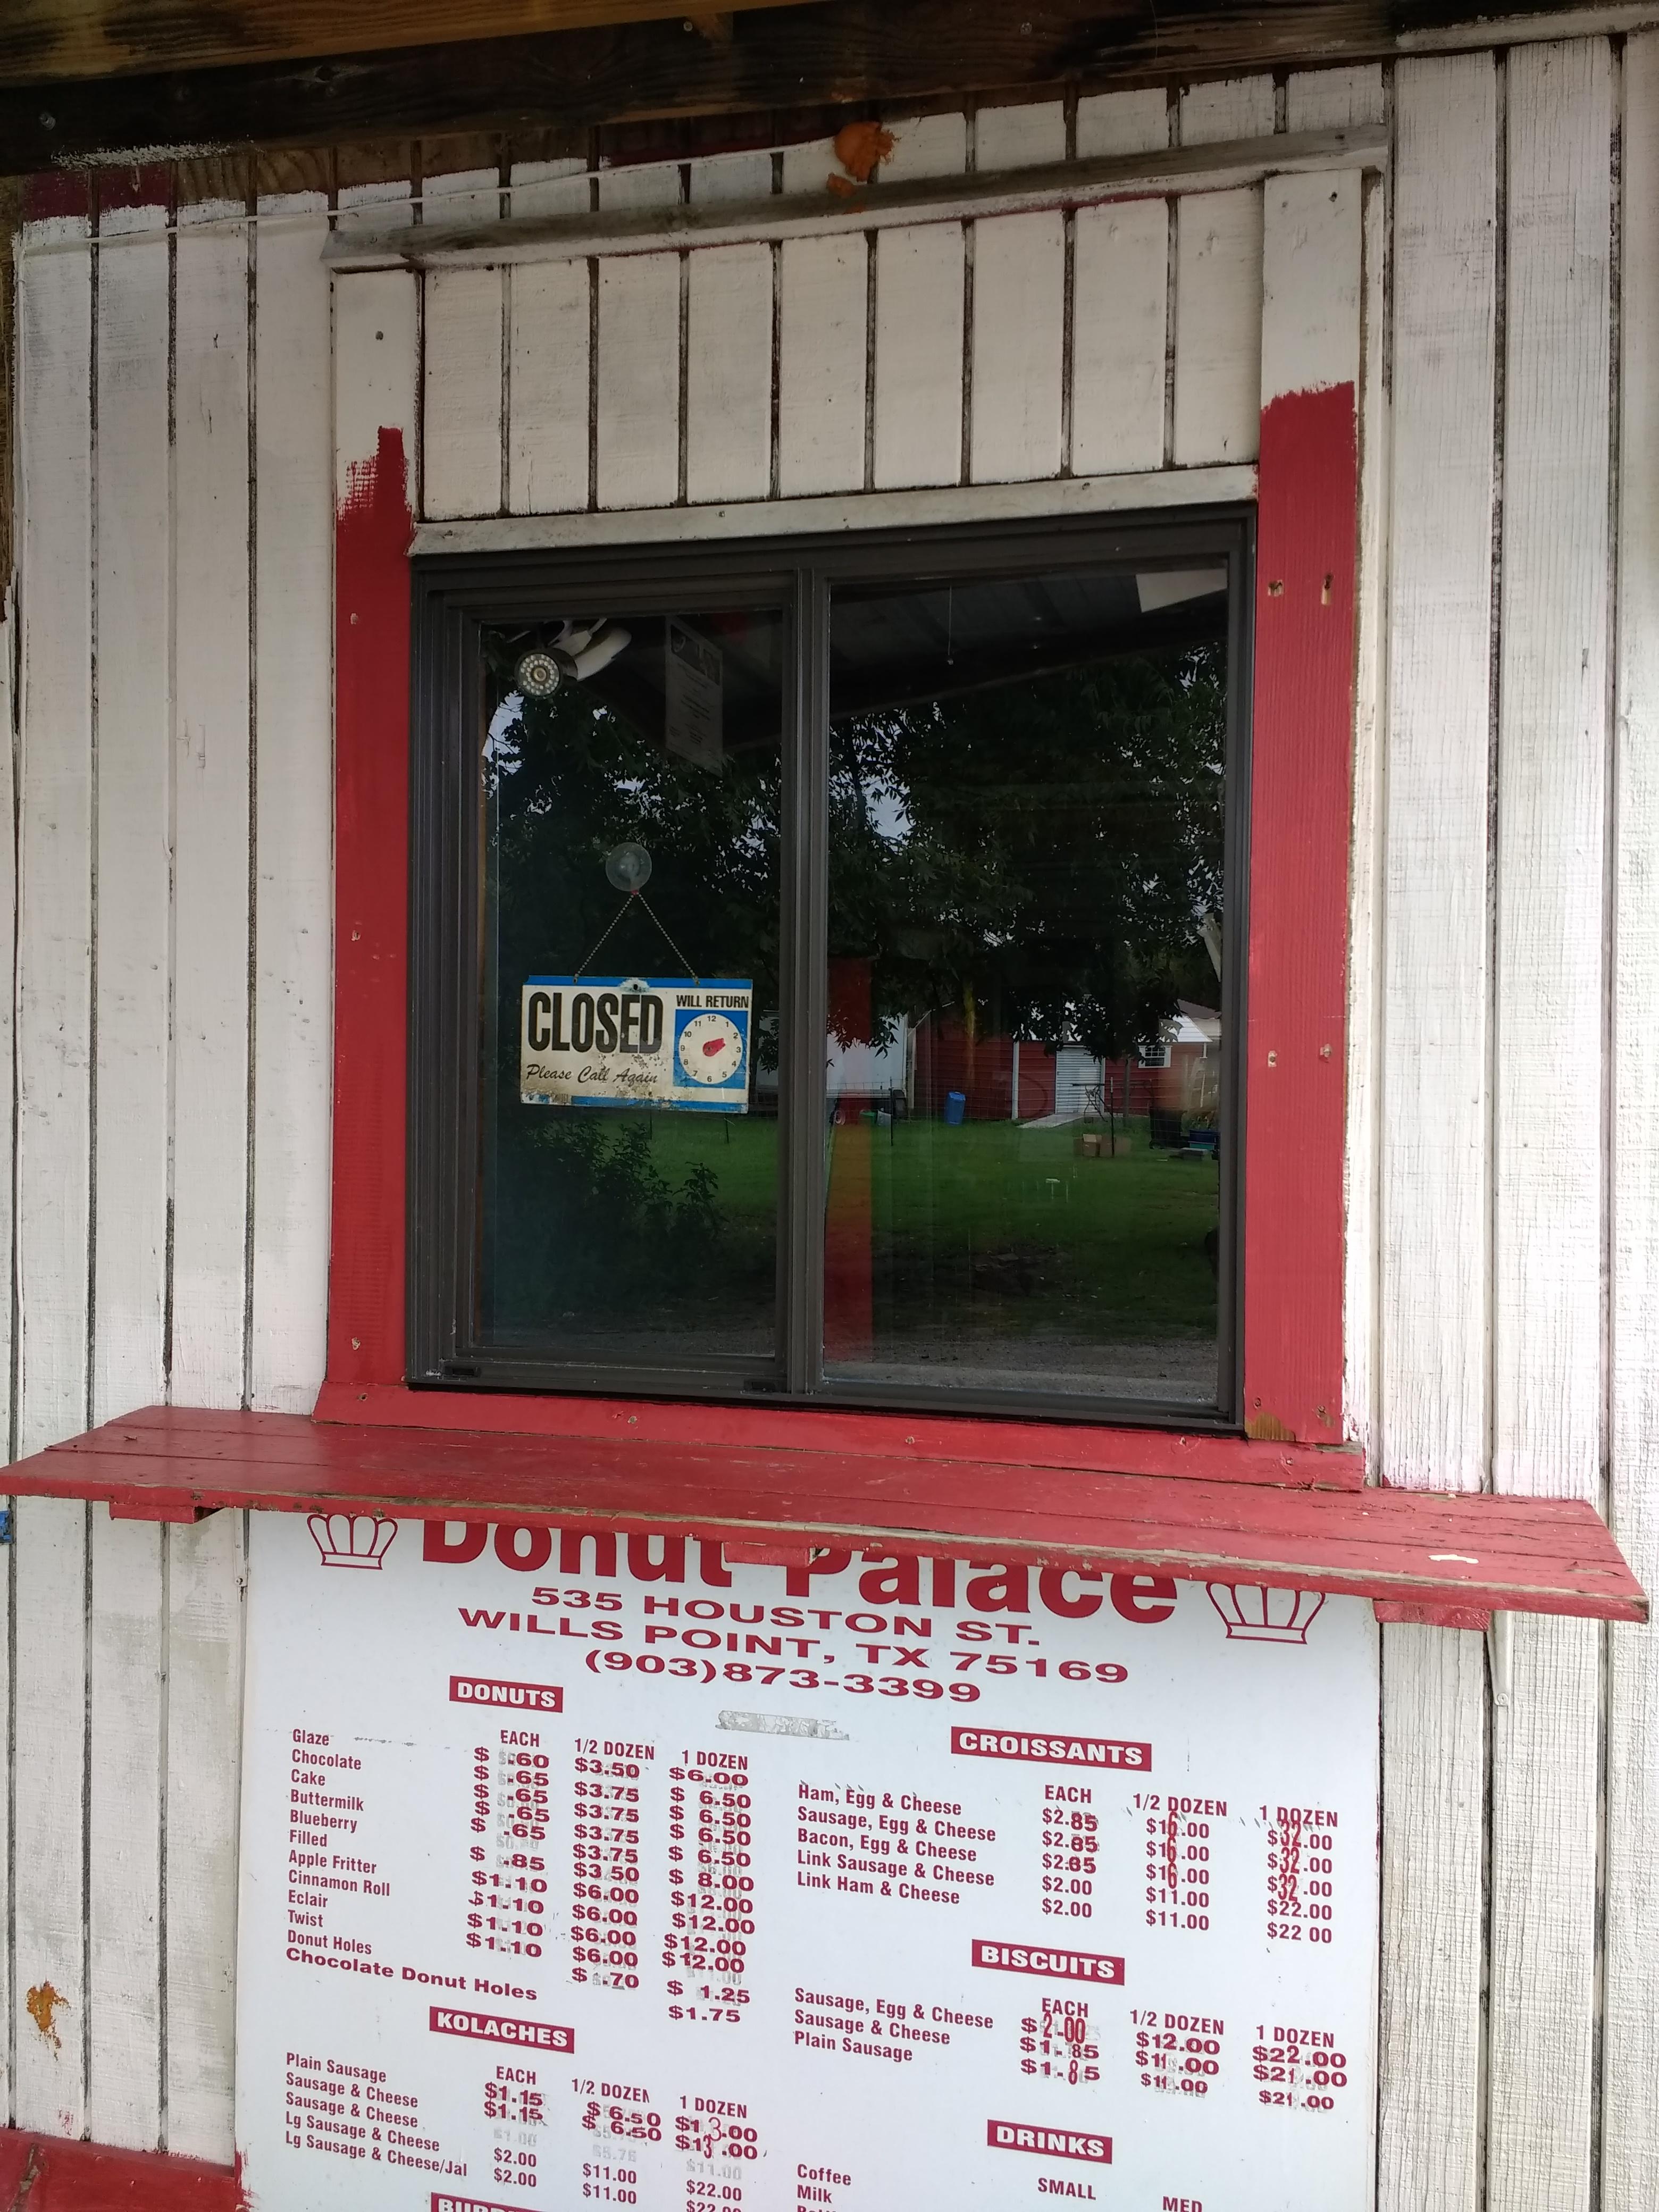 Donut Palace Drive-Thru Window Replacement